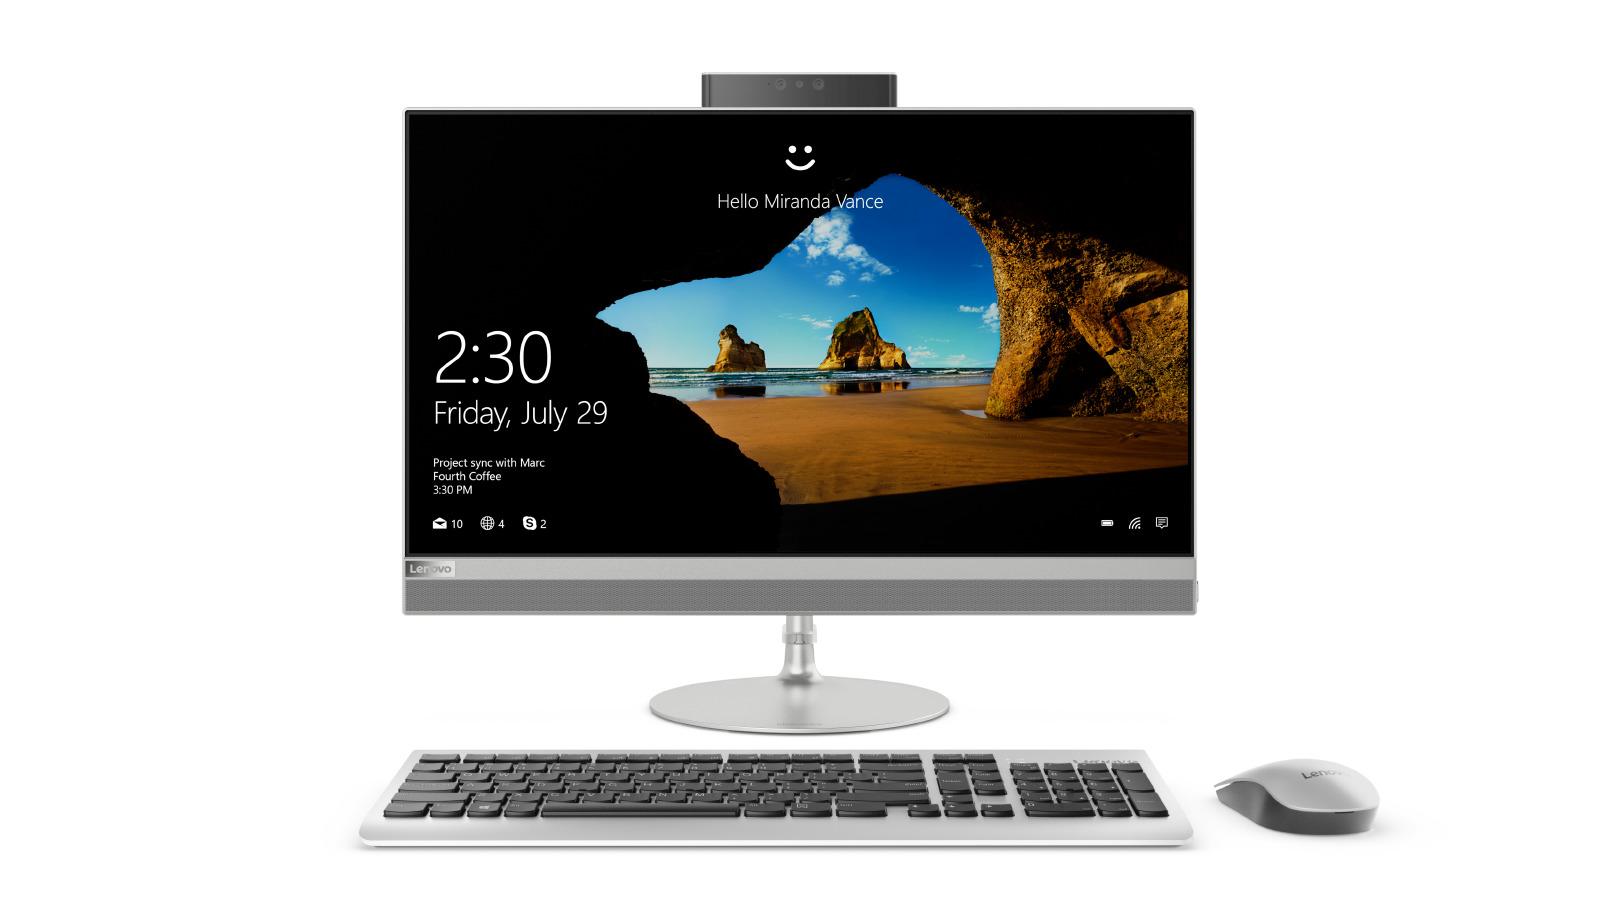 Lenovo AIO 520 23.8''FHD/i5-8400T/12G/1TB/AMD2G/W10